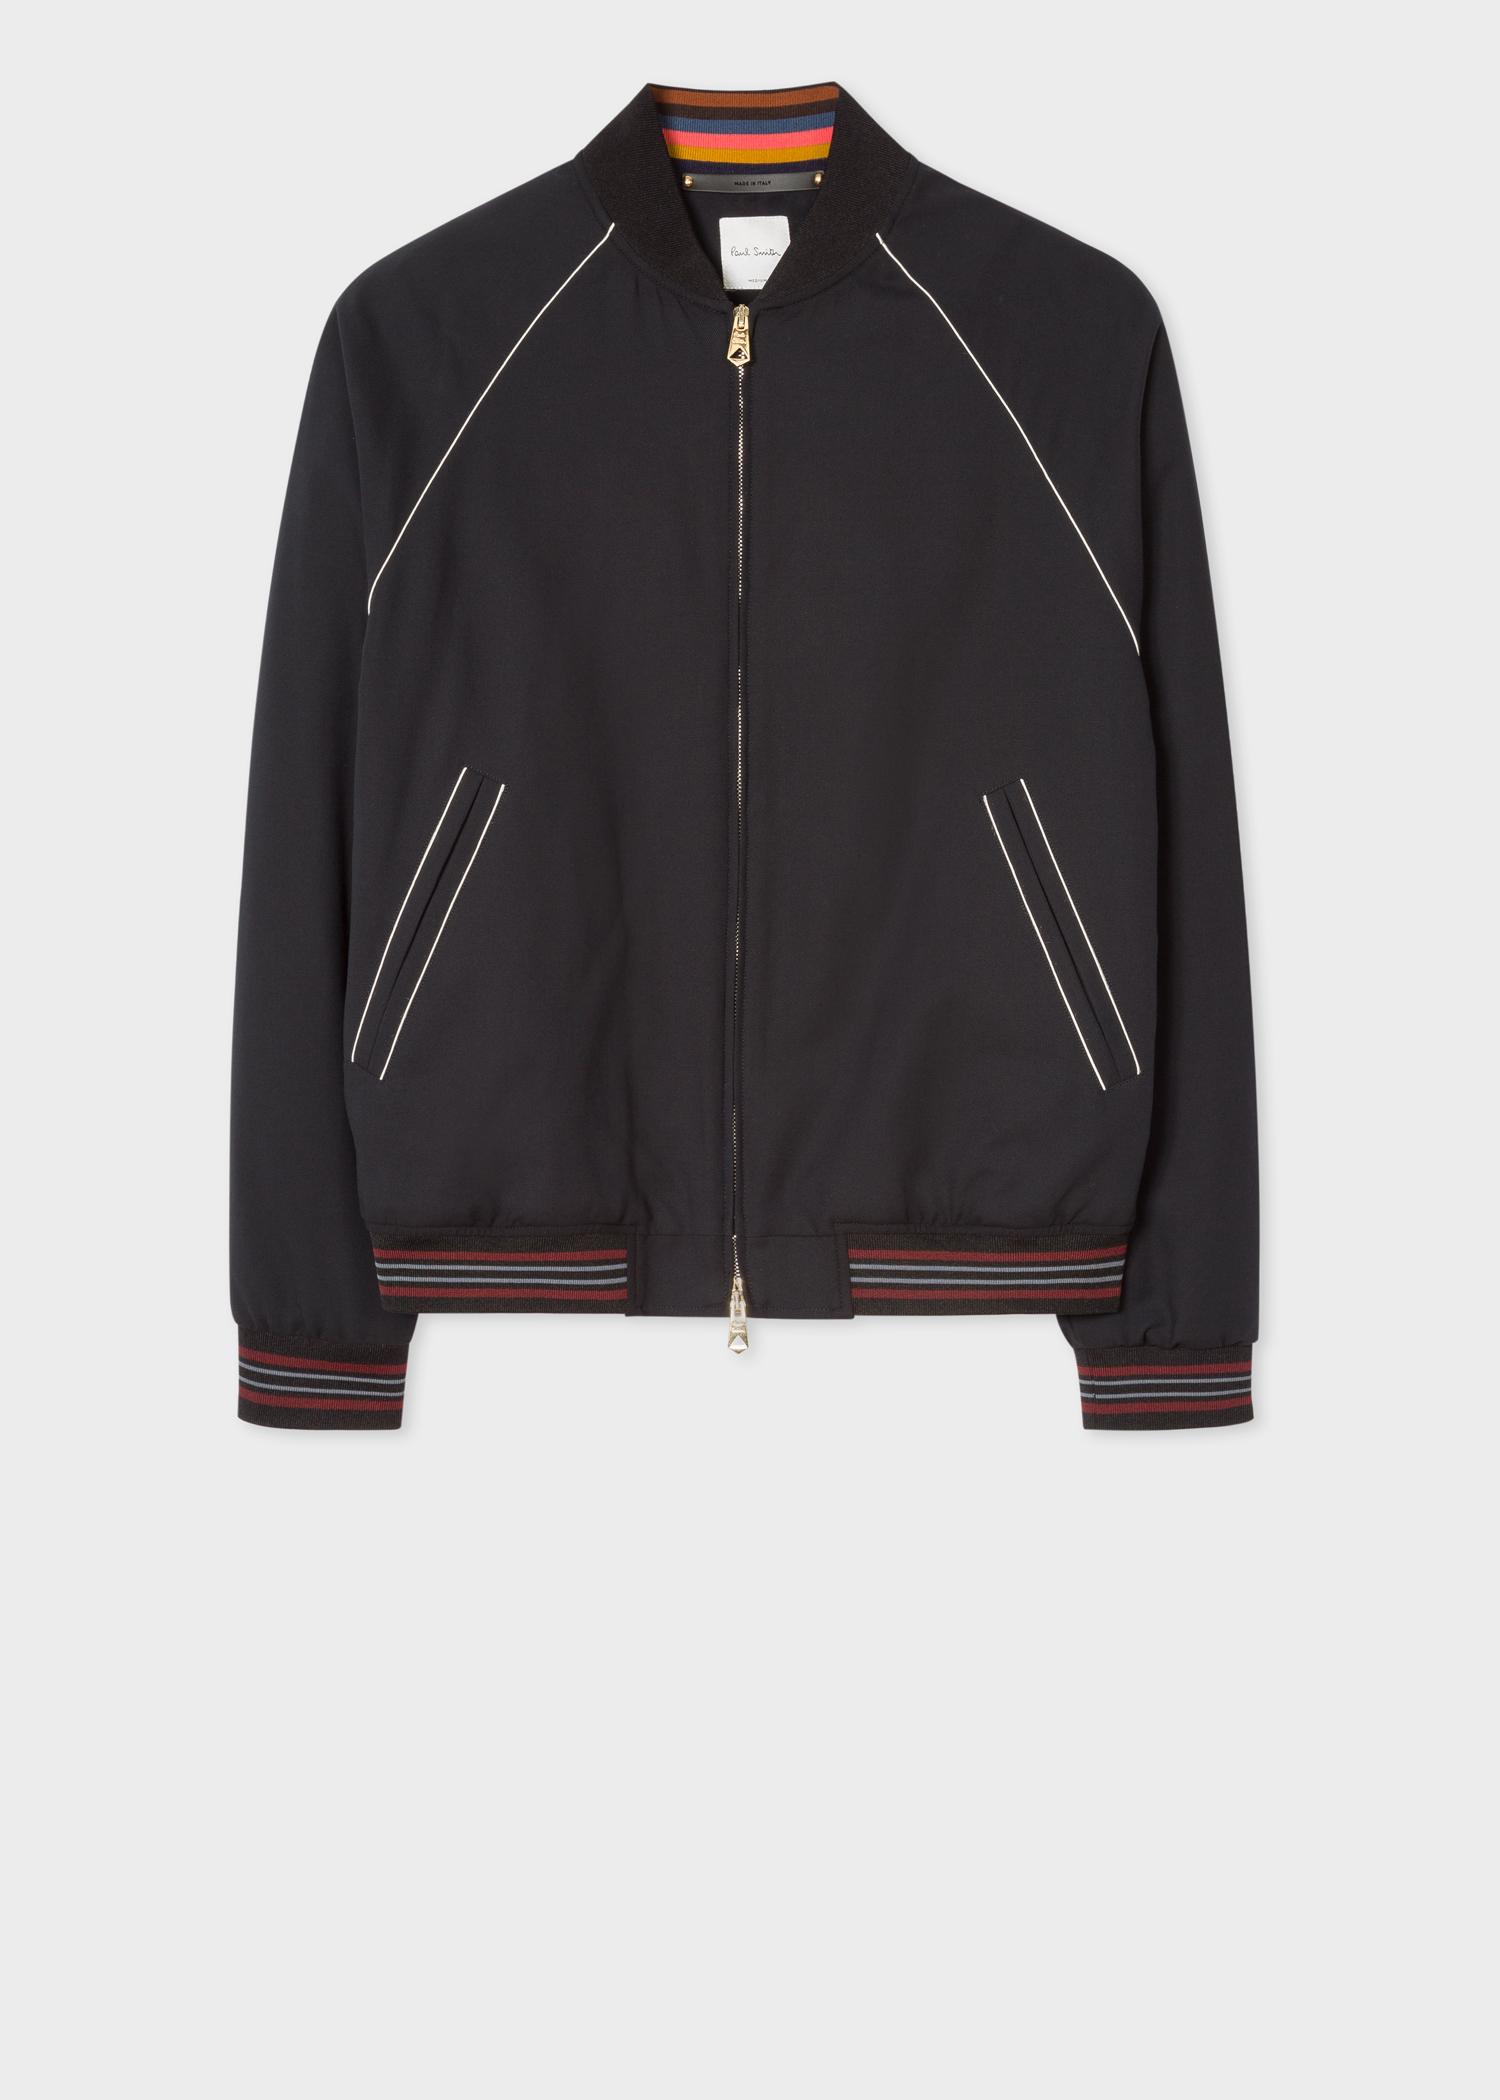 1d51a3388 Men's Black 'Artist Studio' Cotton Bomber Jacket